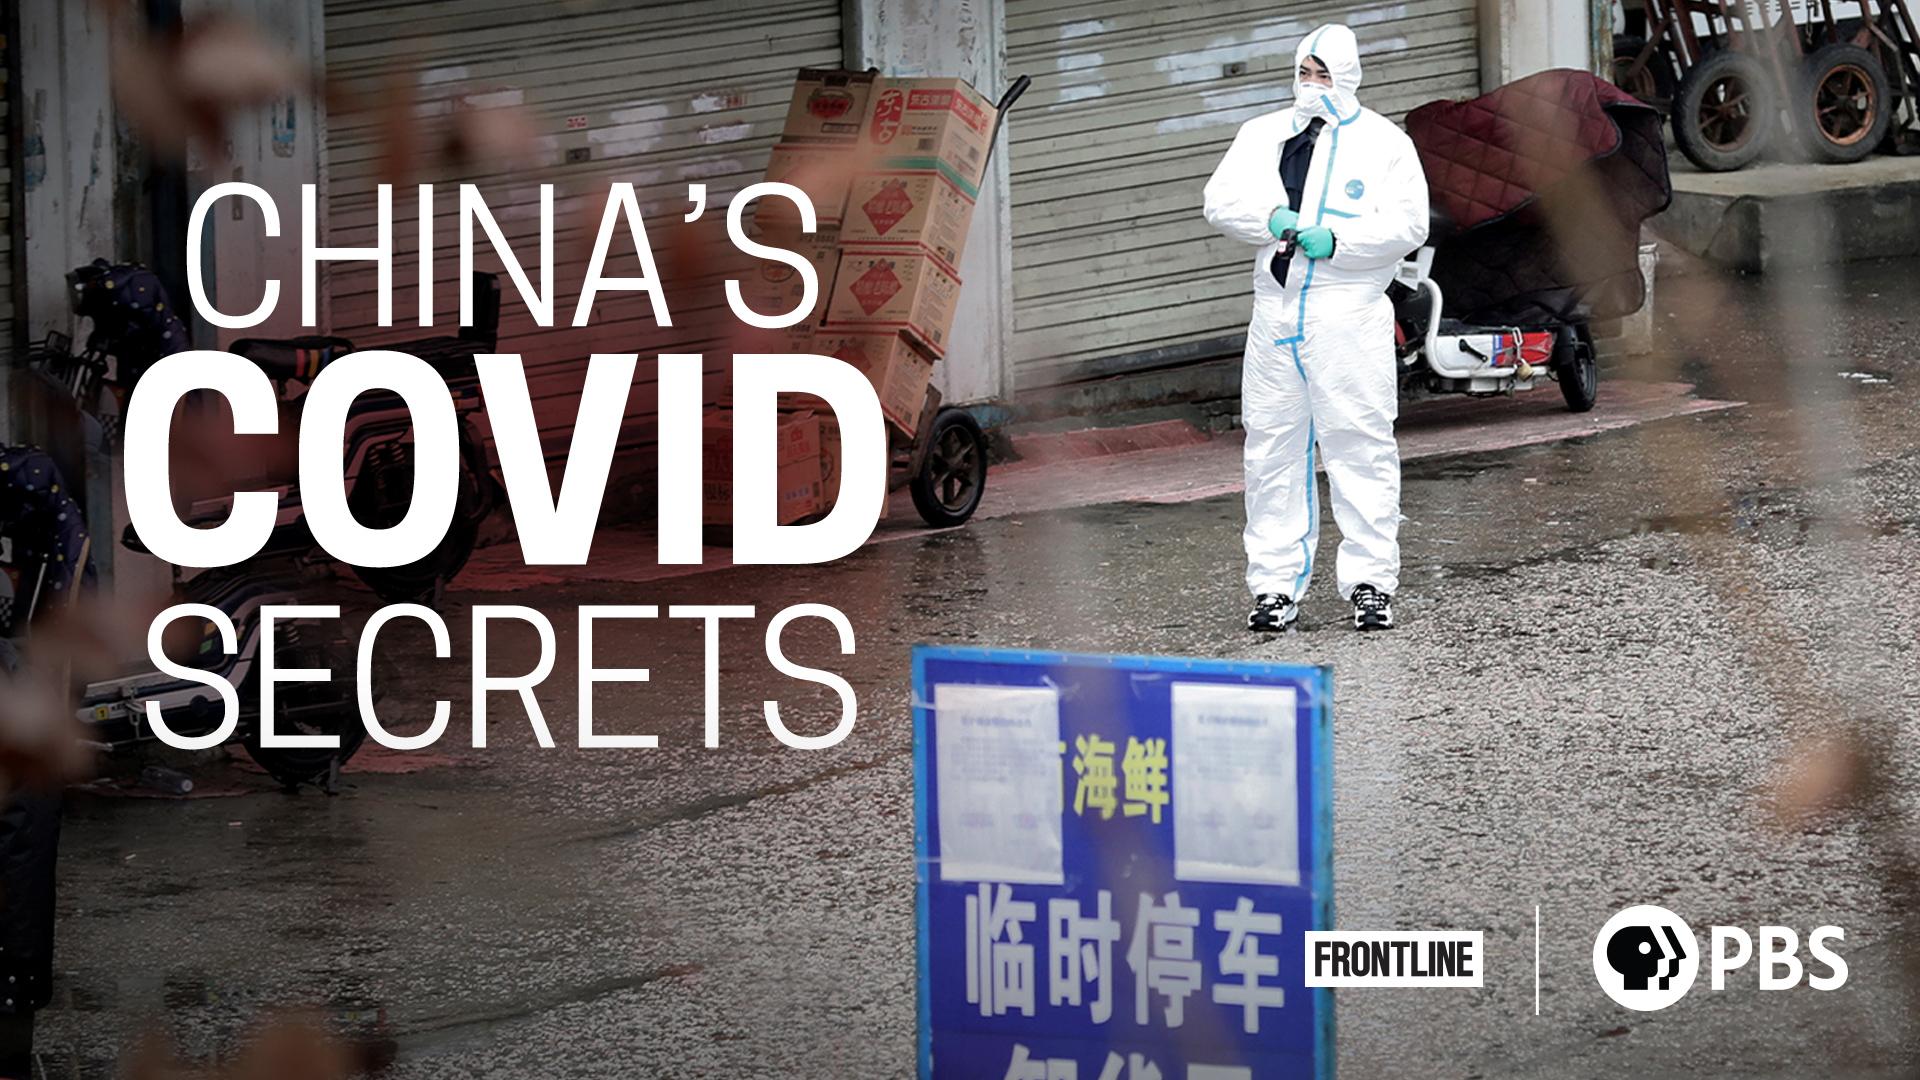 China's COVID Secrets